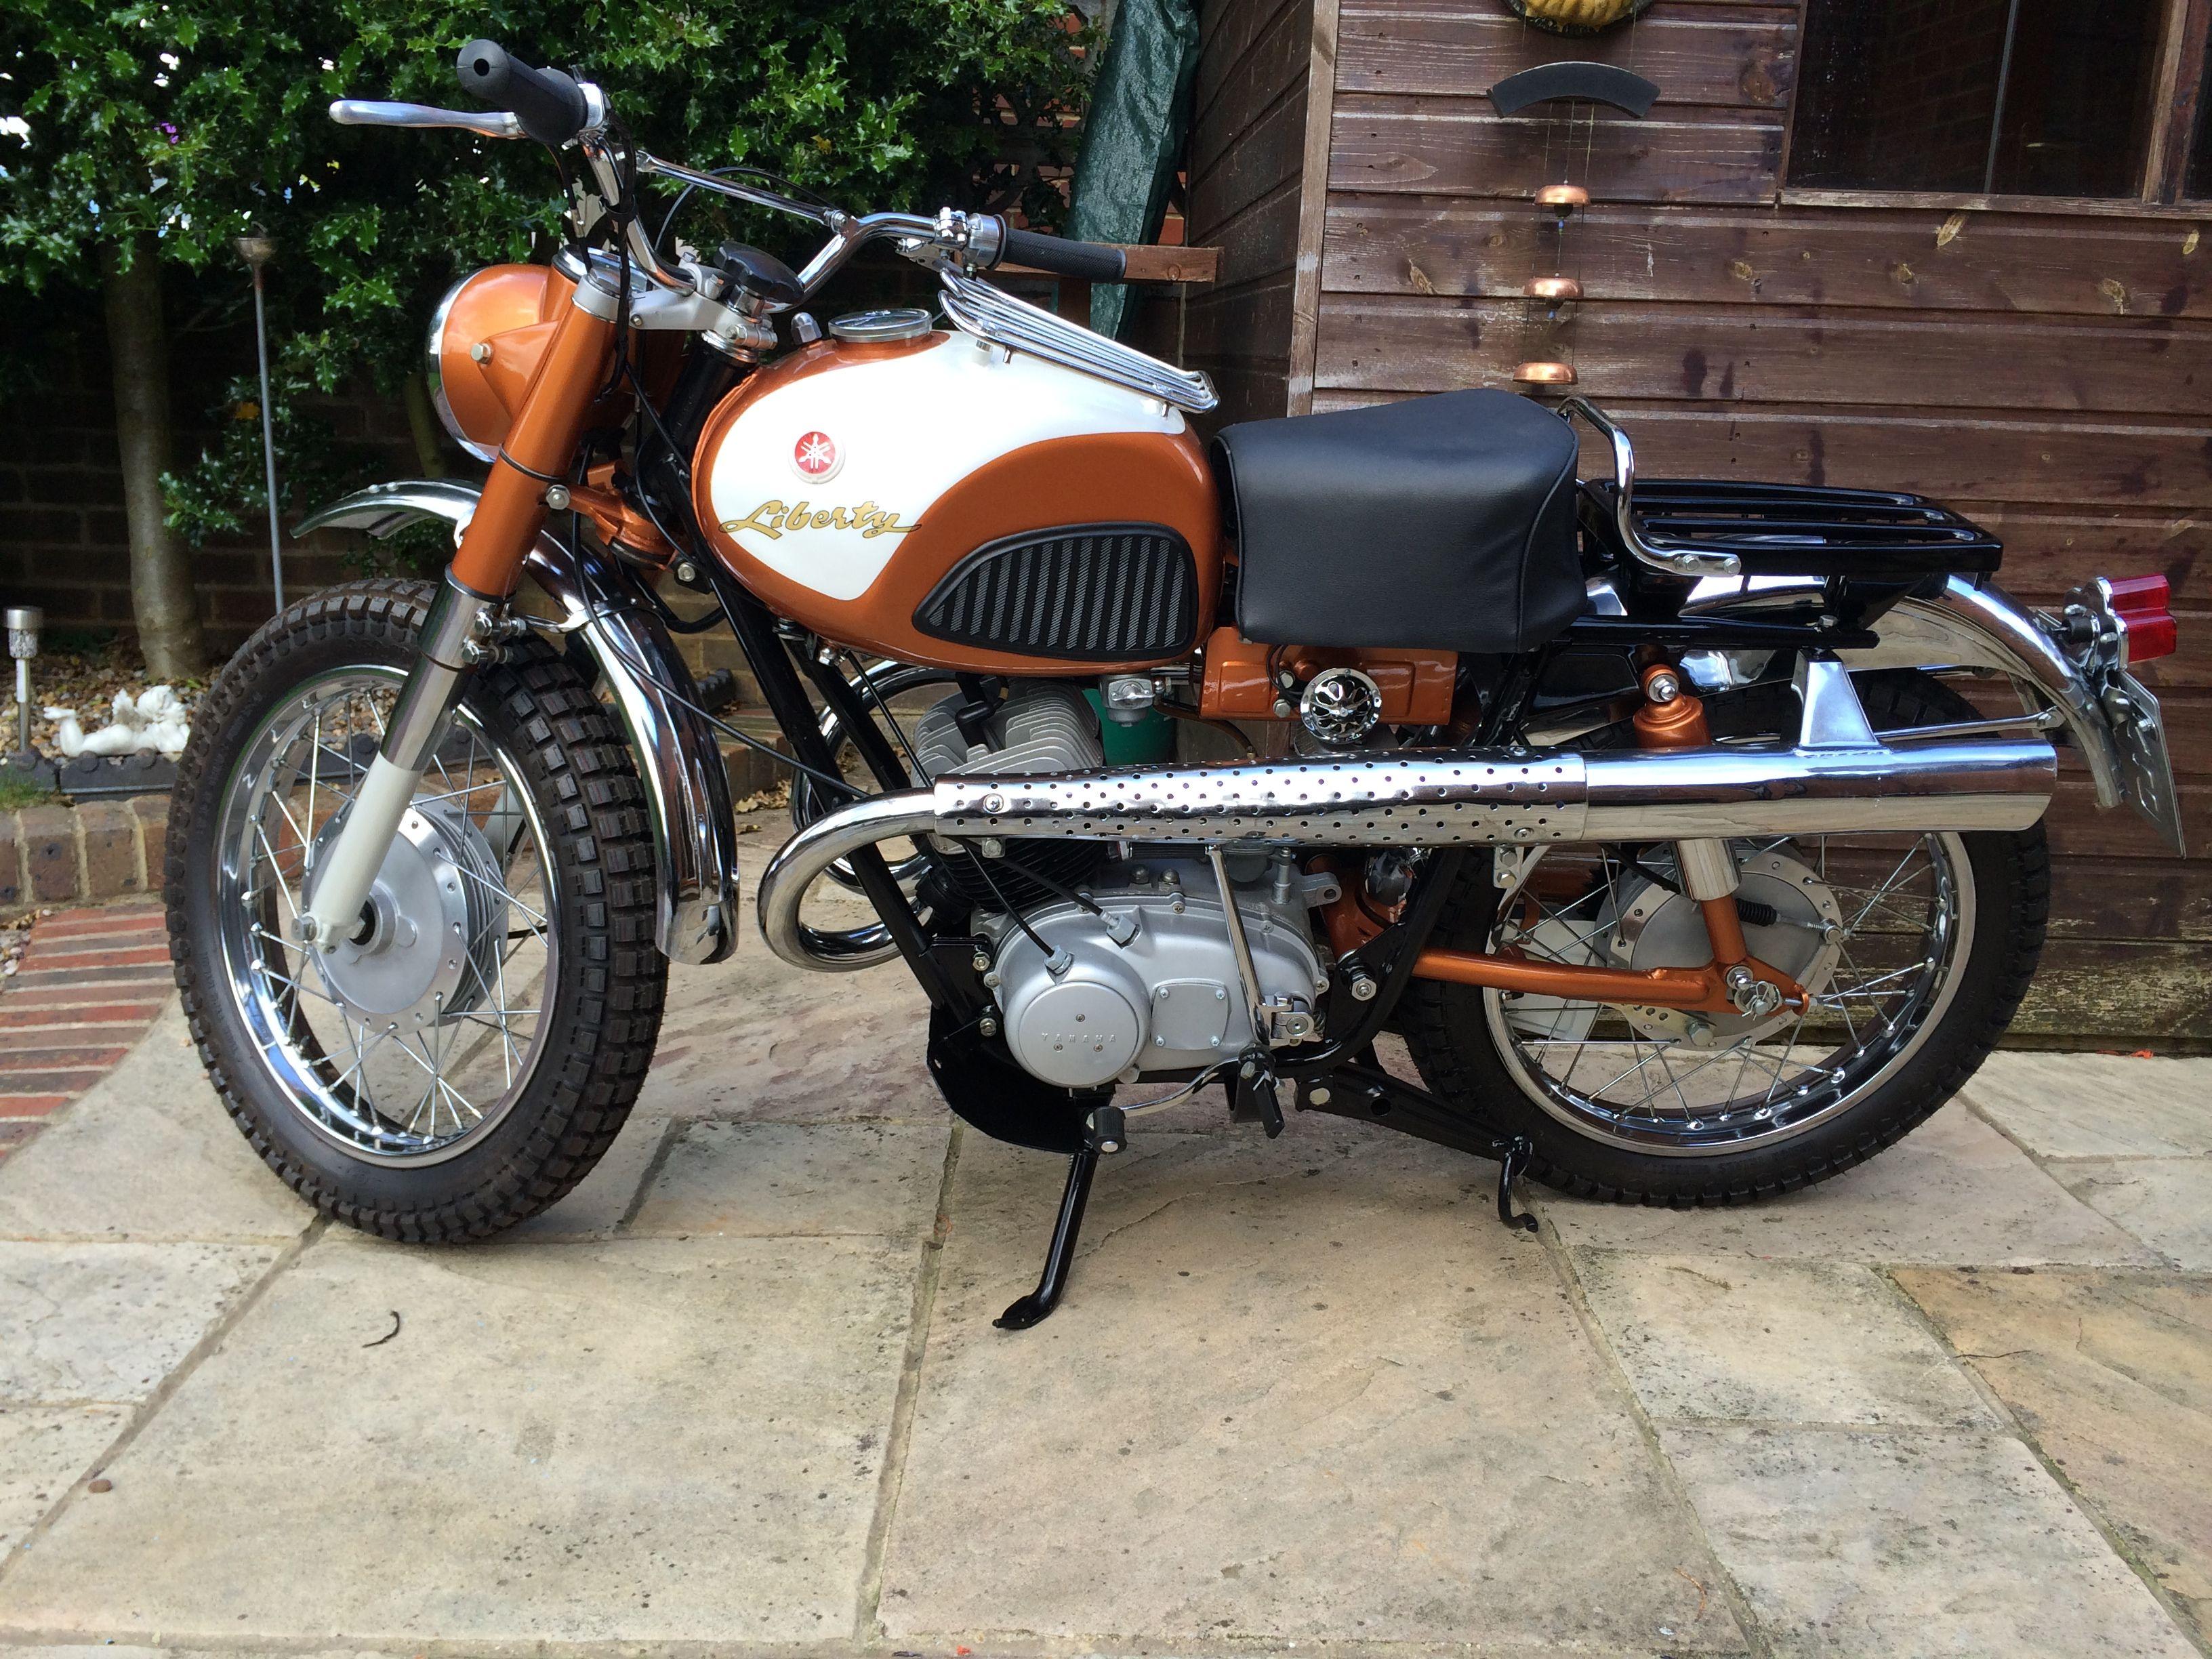 Mark Cowdery S Yamaha Yds1 250cc Developed For Use In Australia Classic Bikes Japanese Motorcycle Yamaha